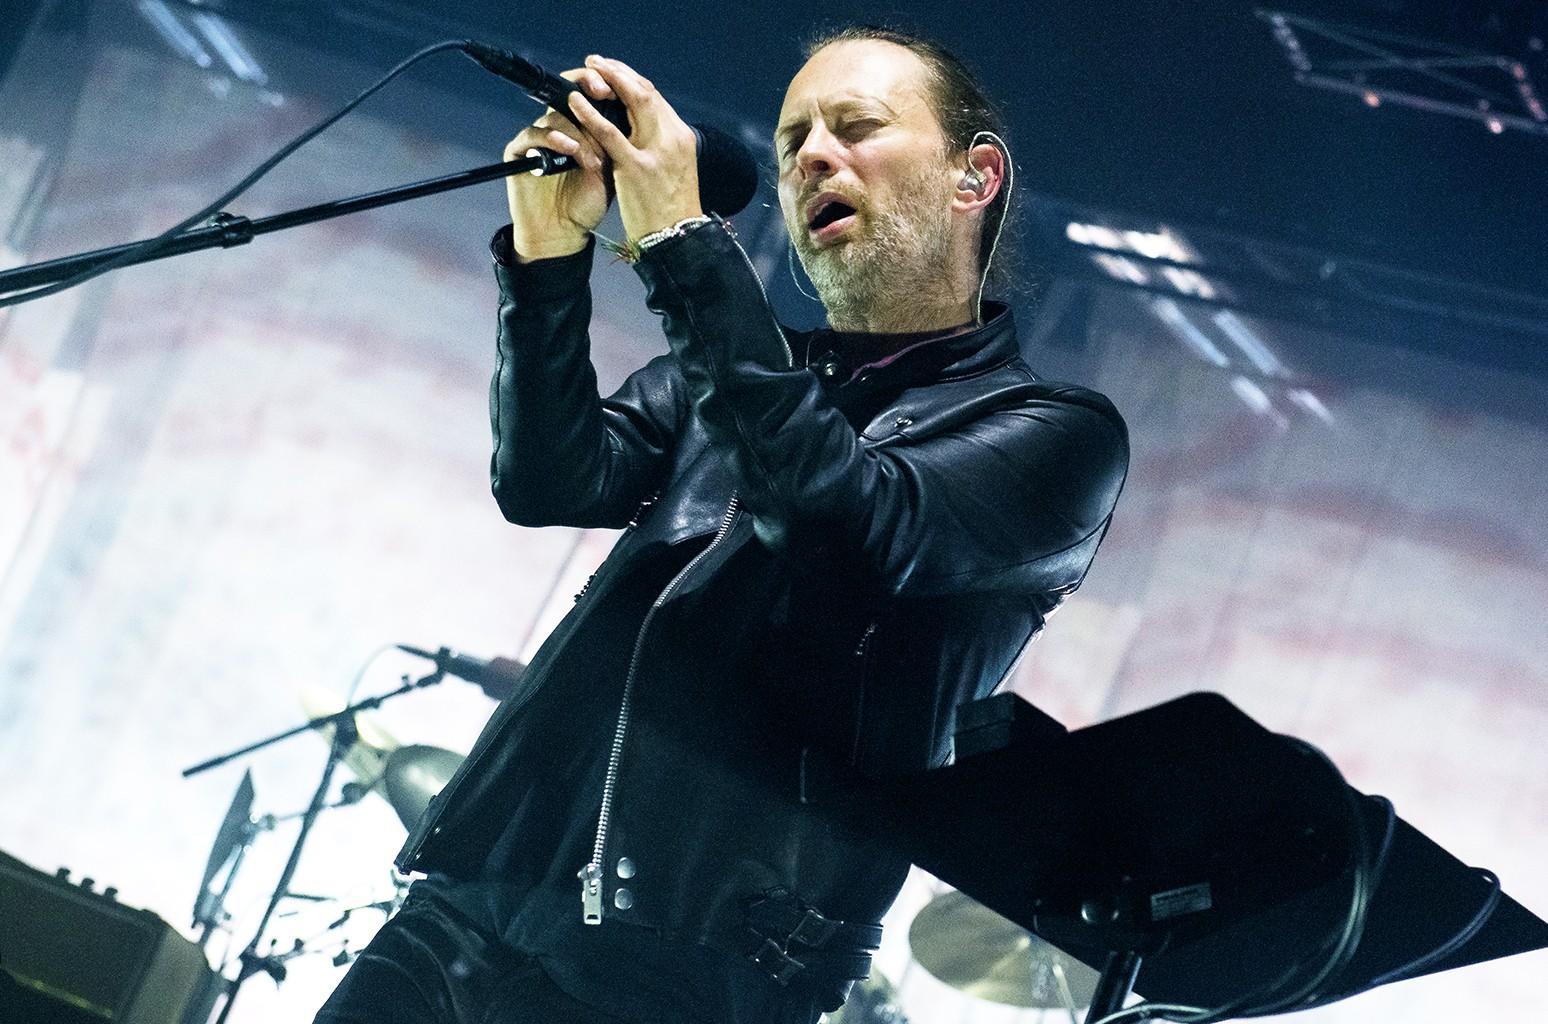 Thom Yorke of Radiohead performs in London